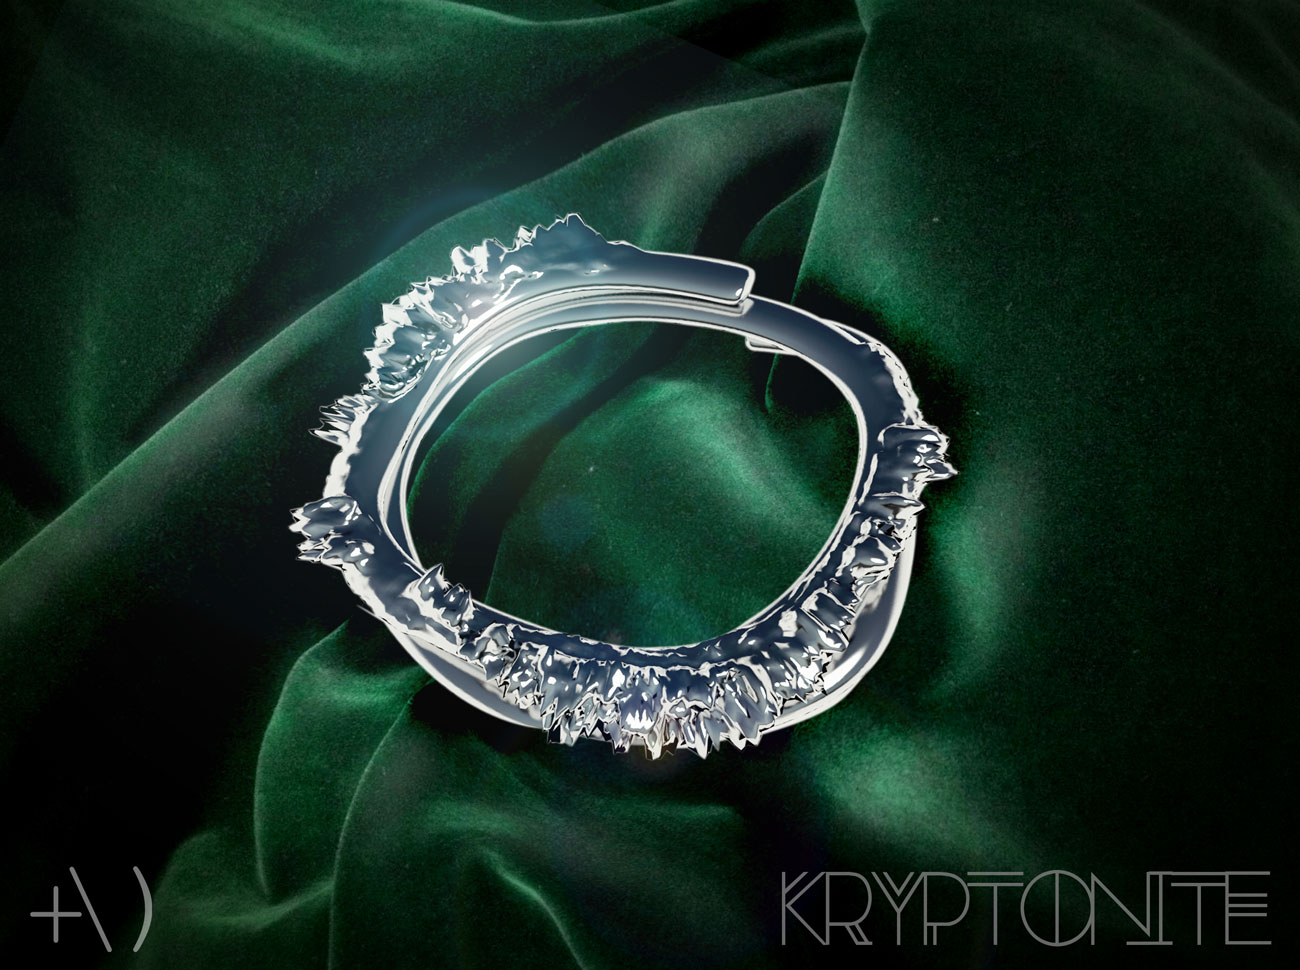 kryptonite brooch and bangle